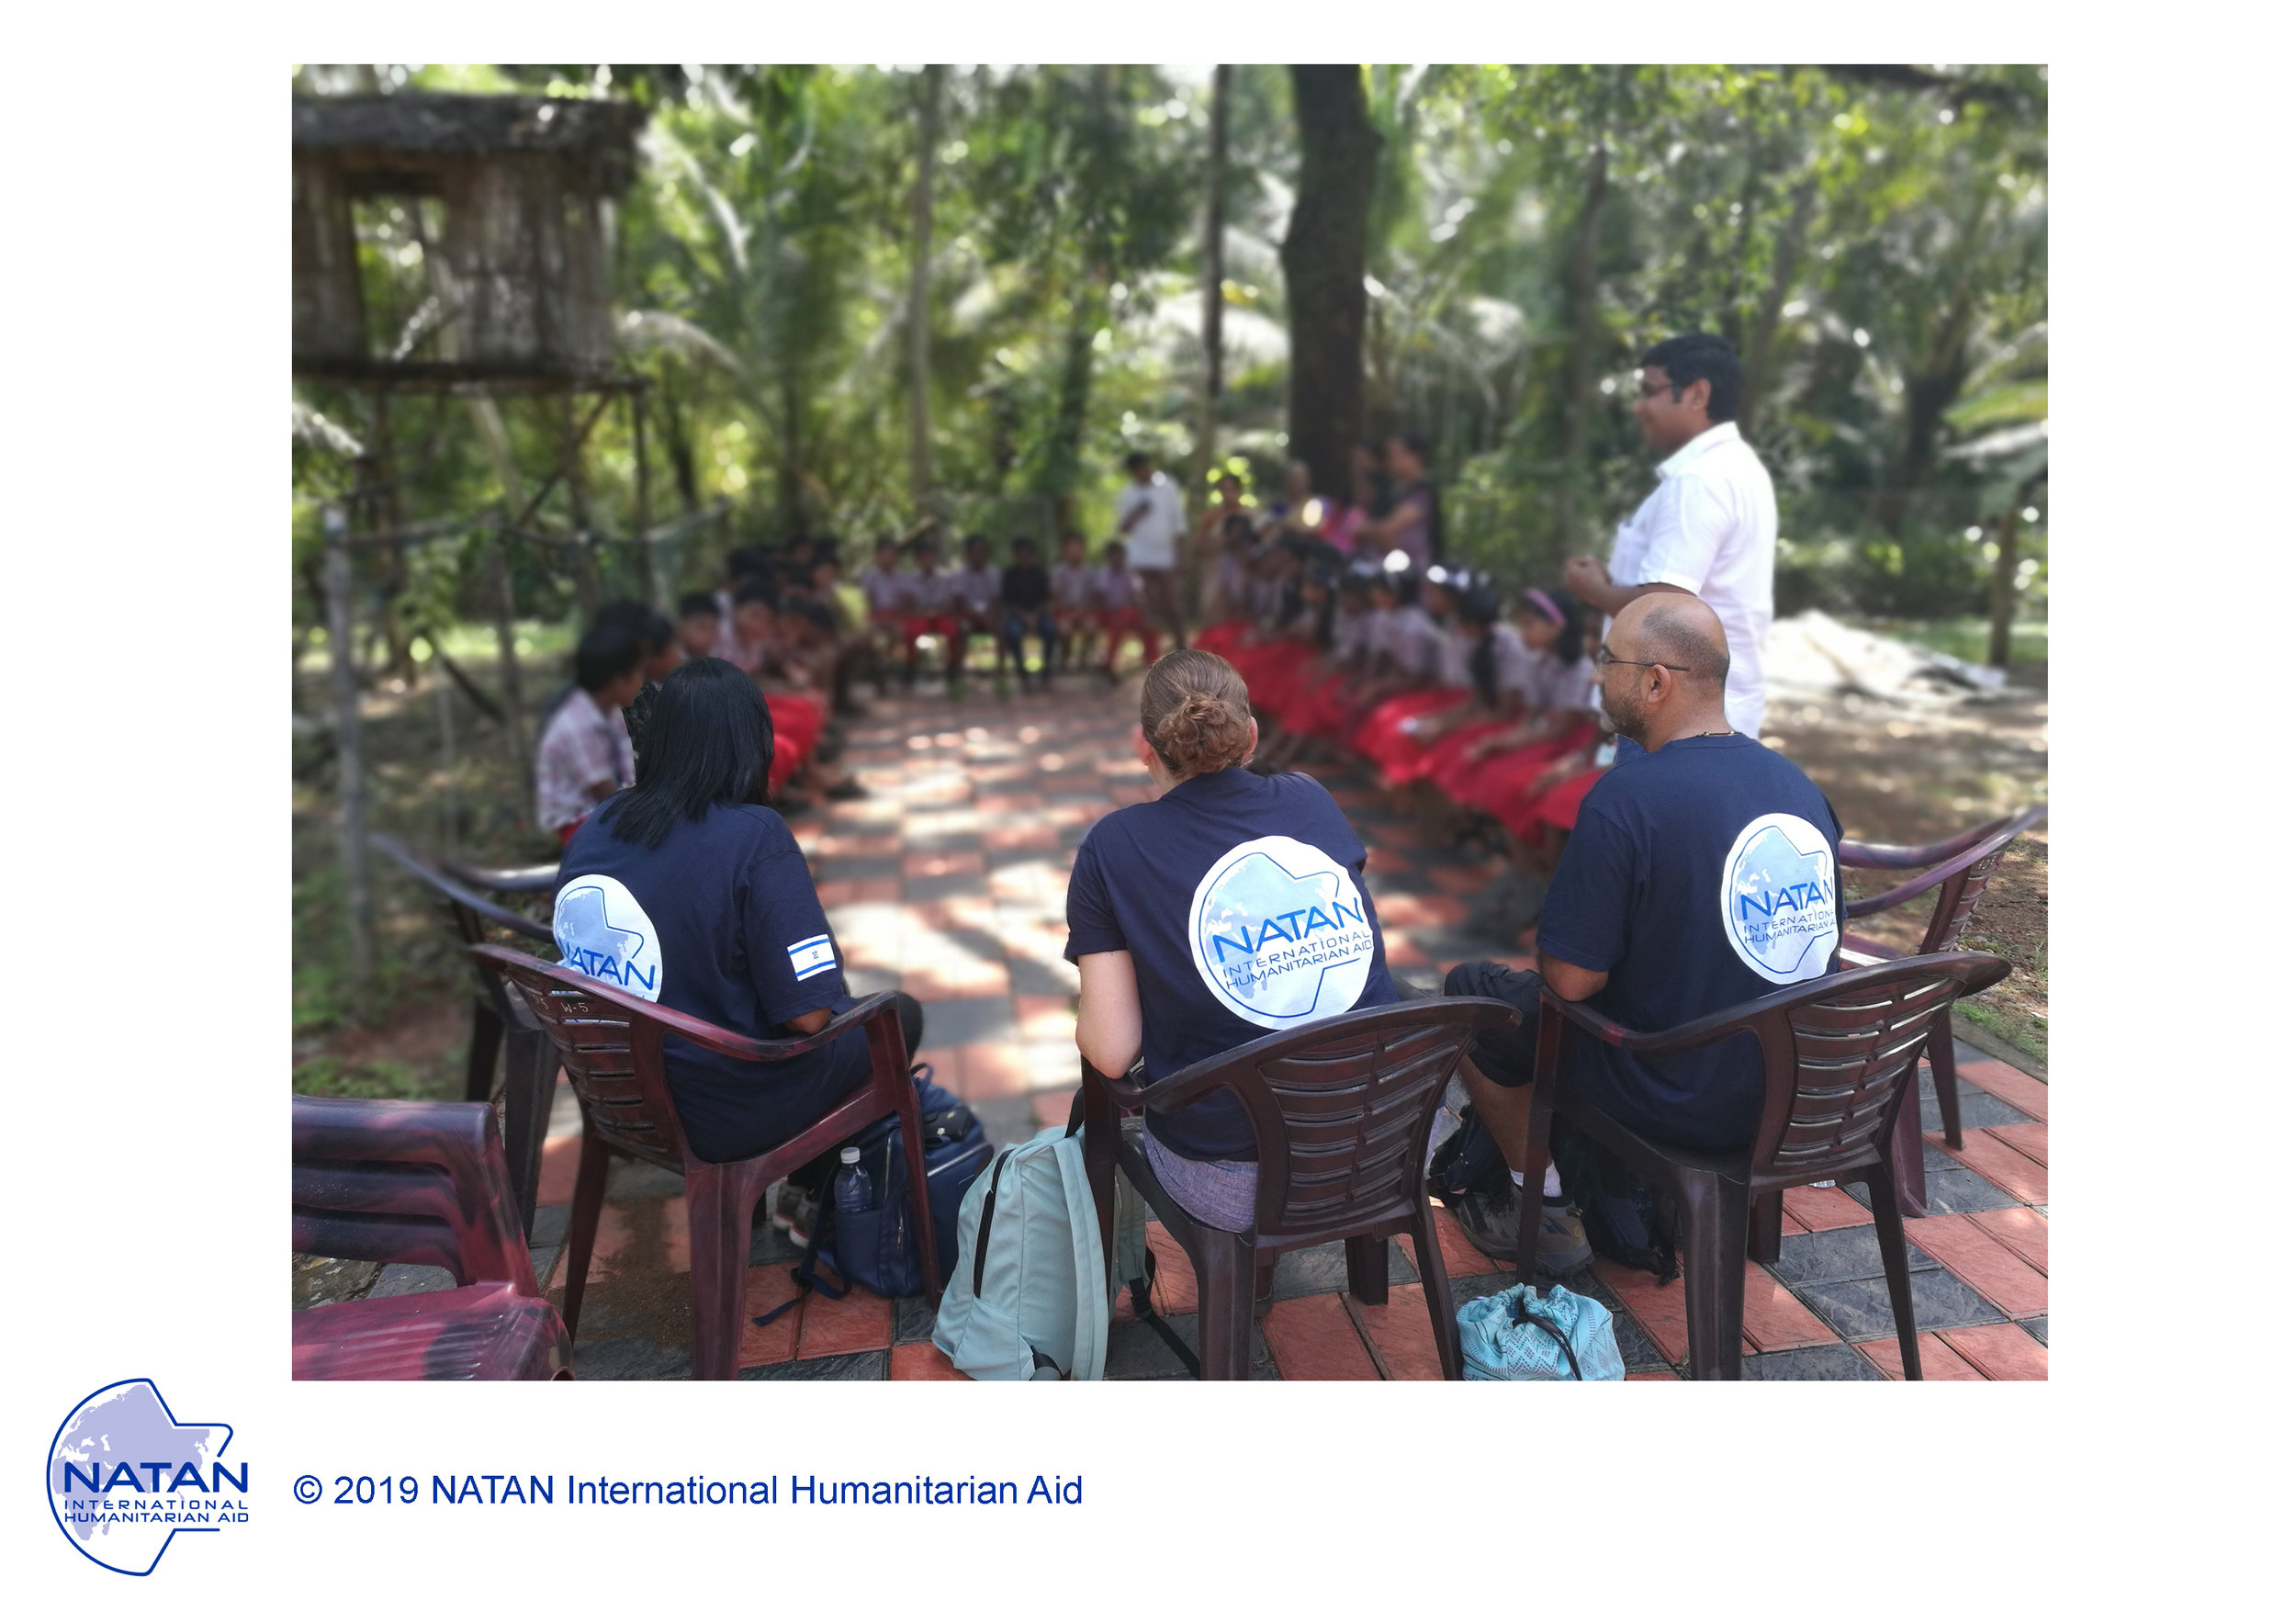 india 2019 - natan team members meet with schoolchildren, survivors of monsoon flooding in kerala region, india